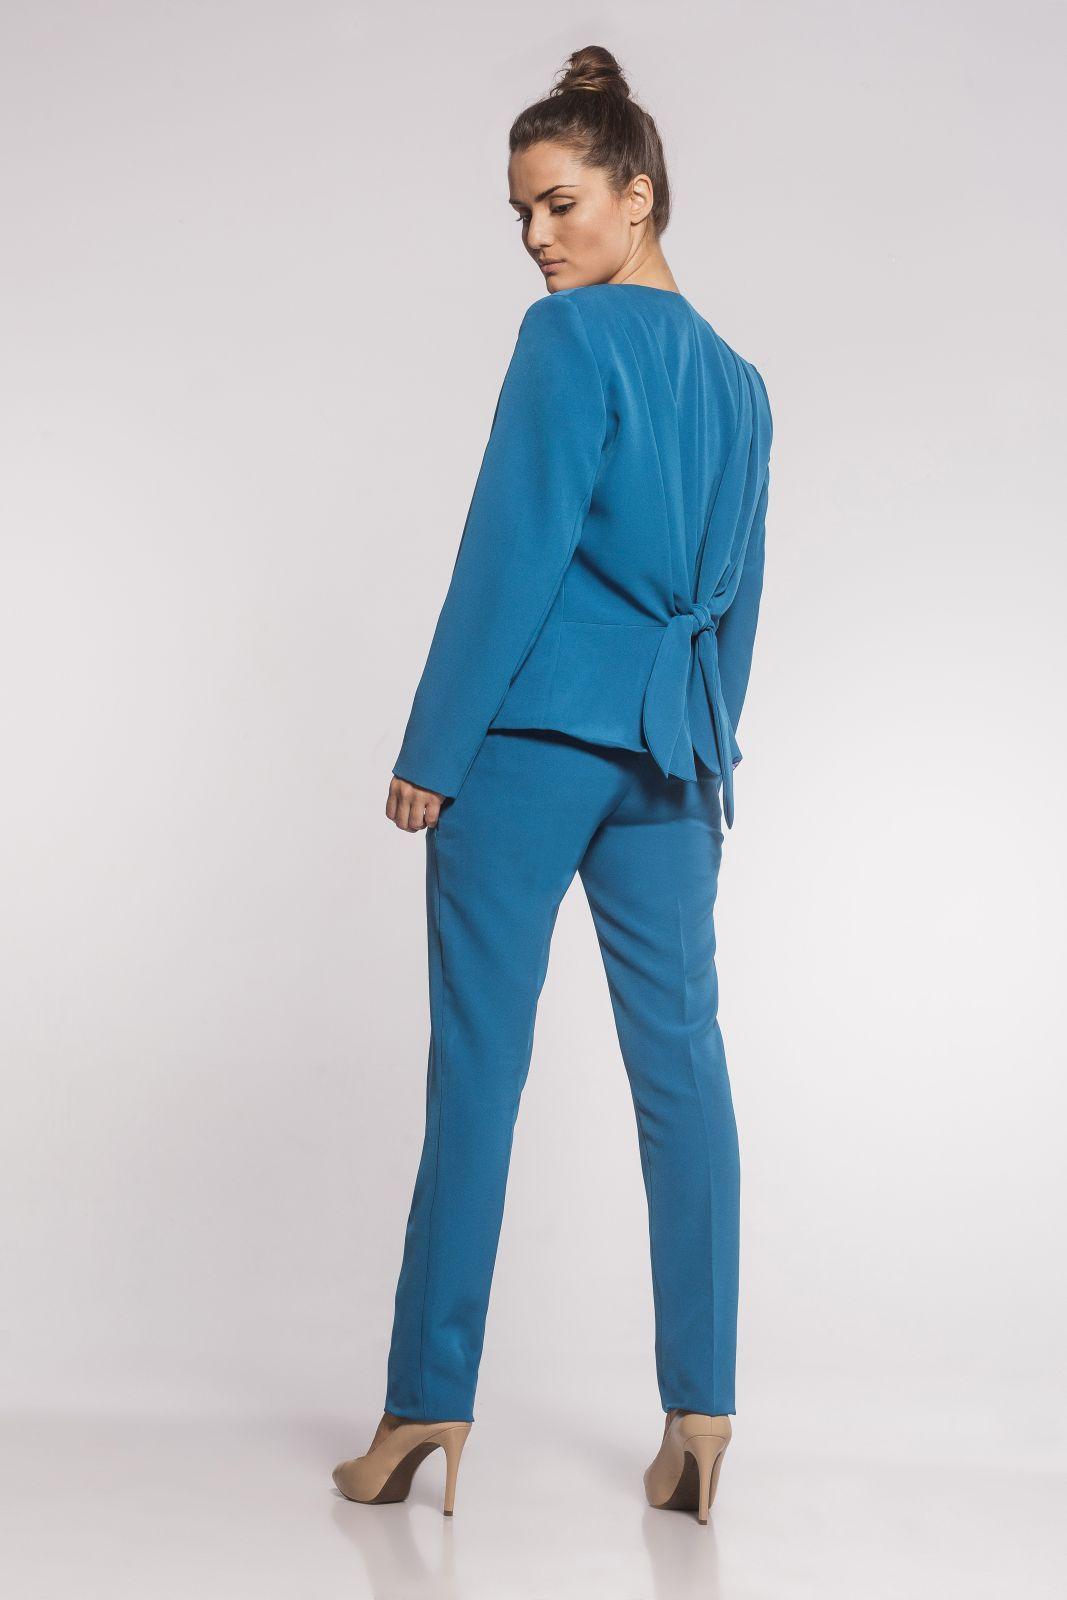 Blazer Feminino Laço Alfaiataria Azul